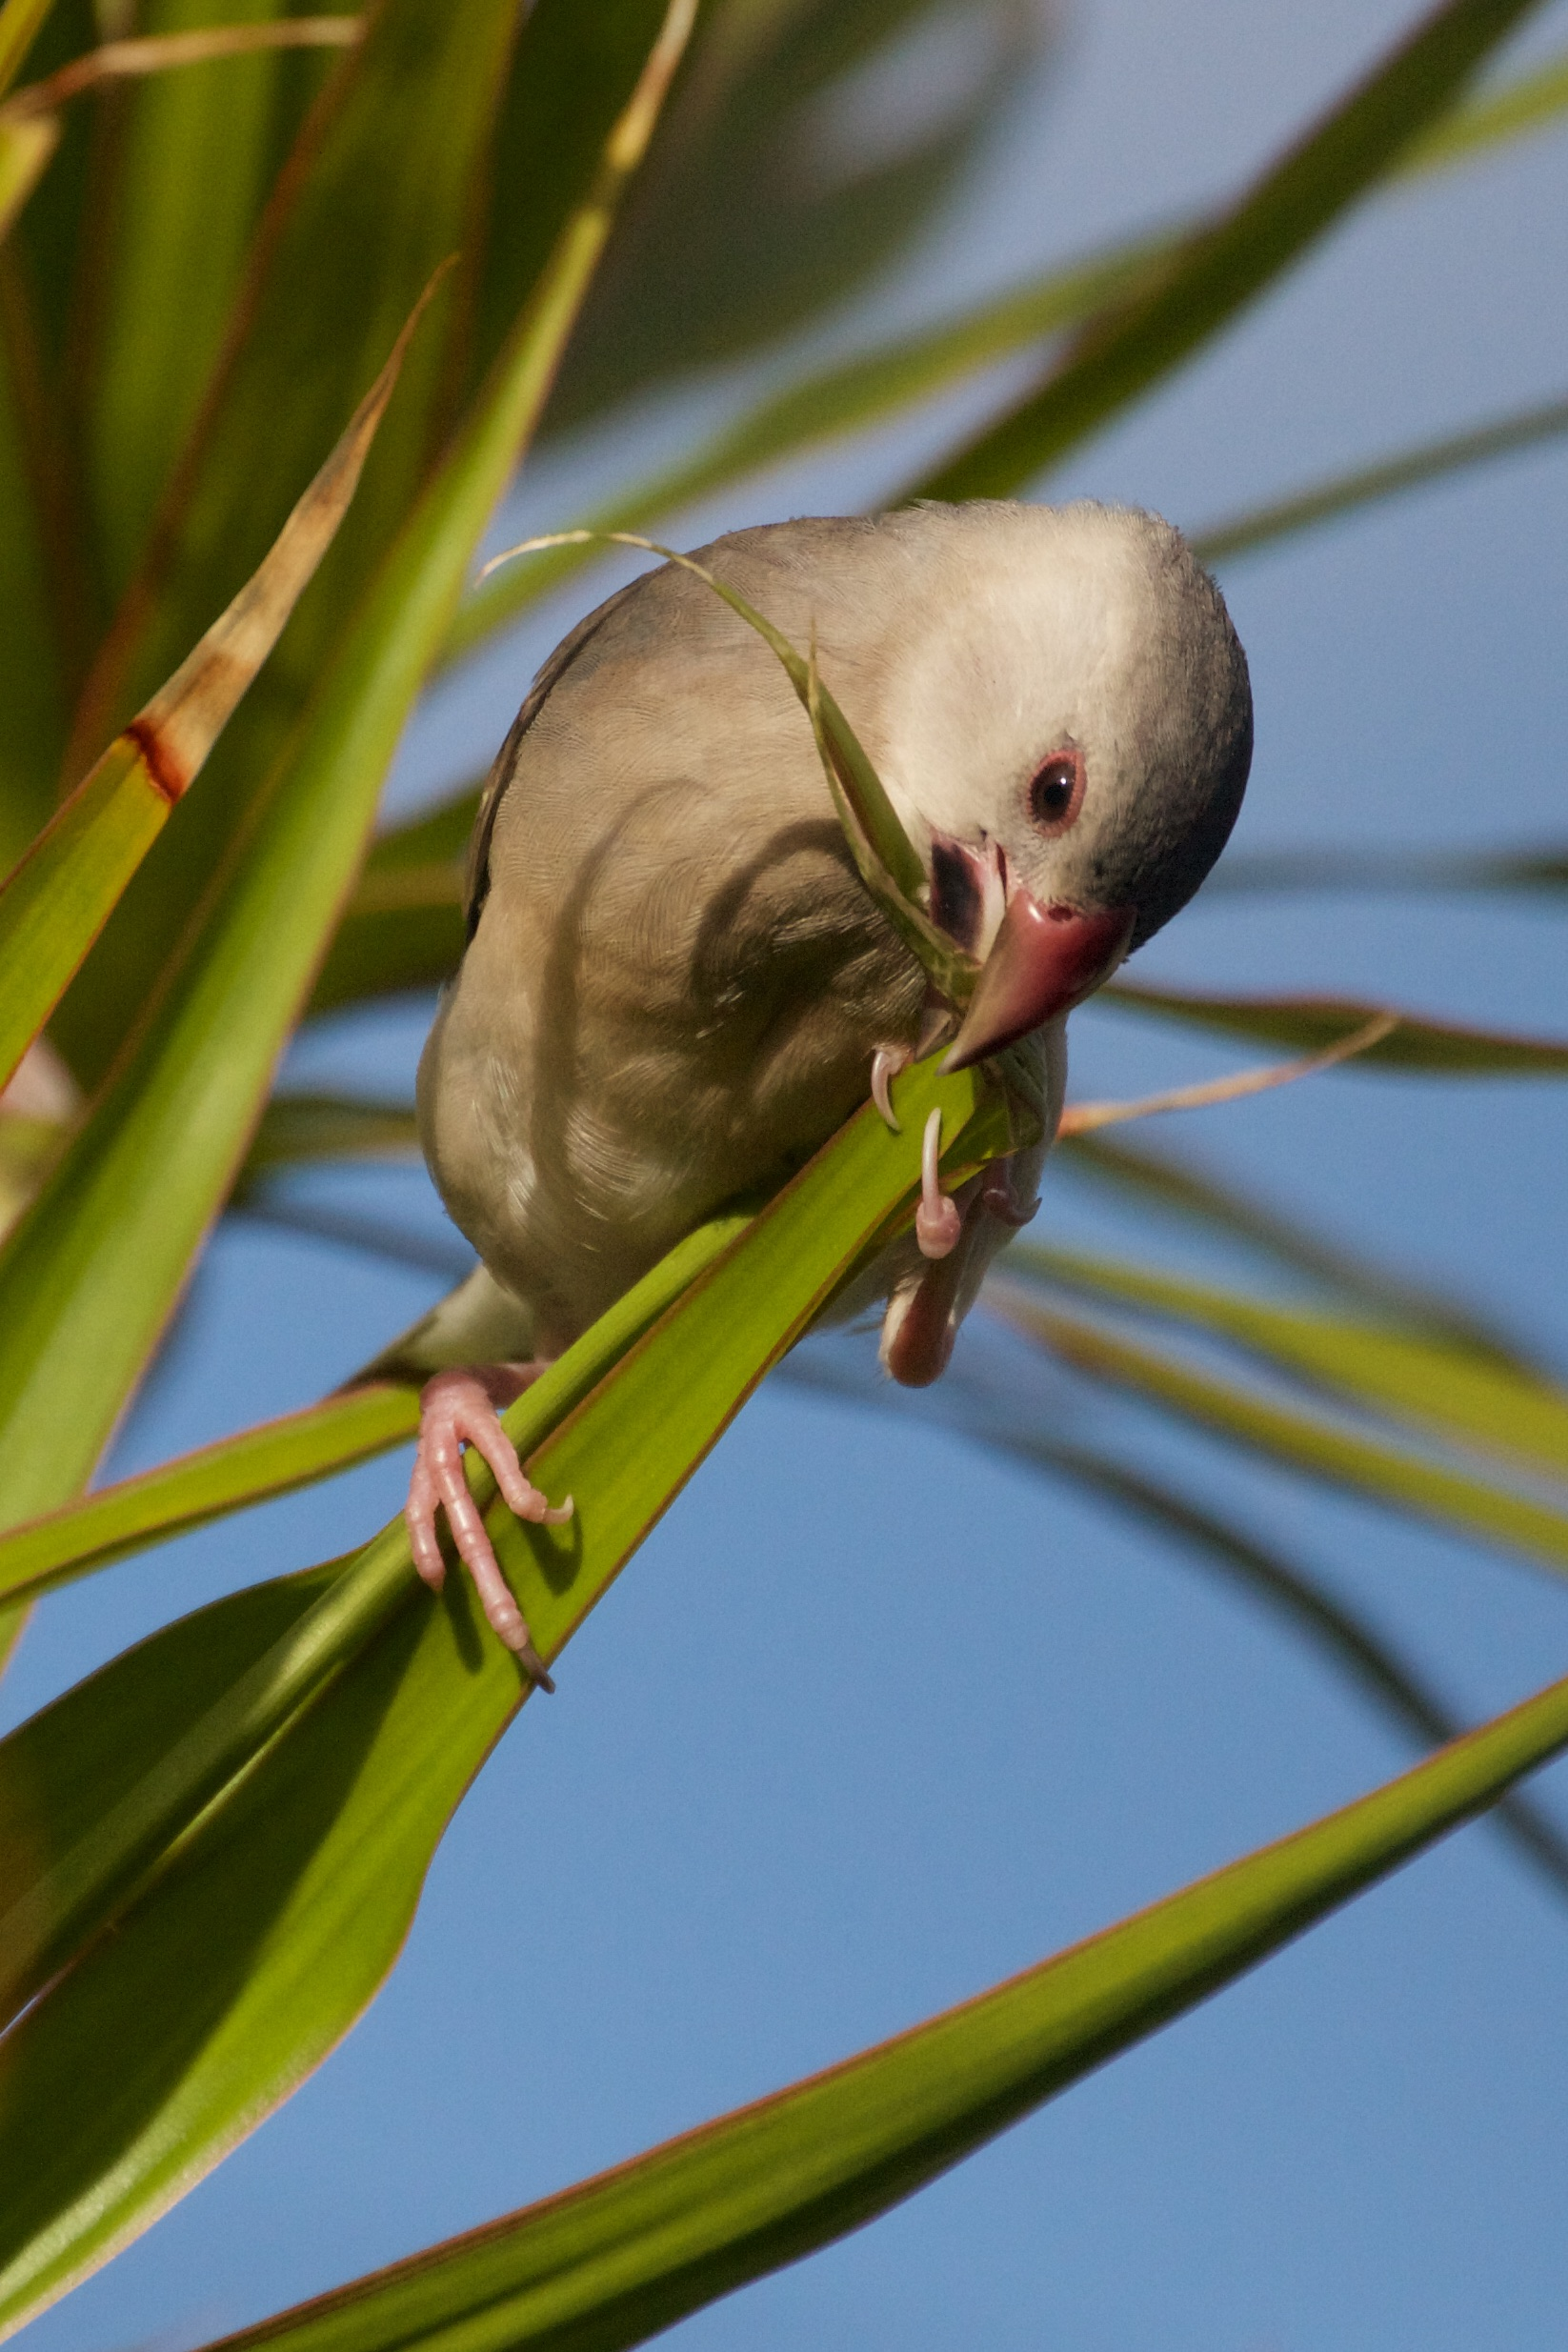 A juvenile Java Sparrow nibbling on a leaf.